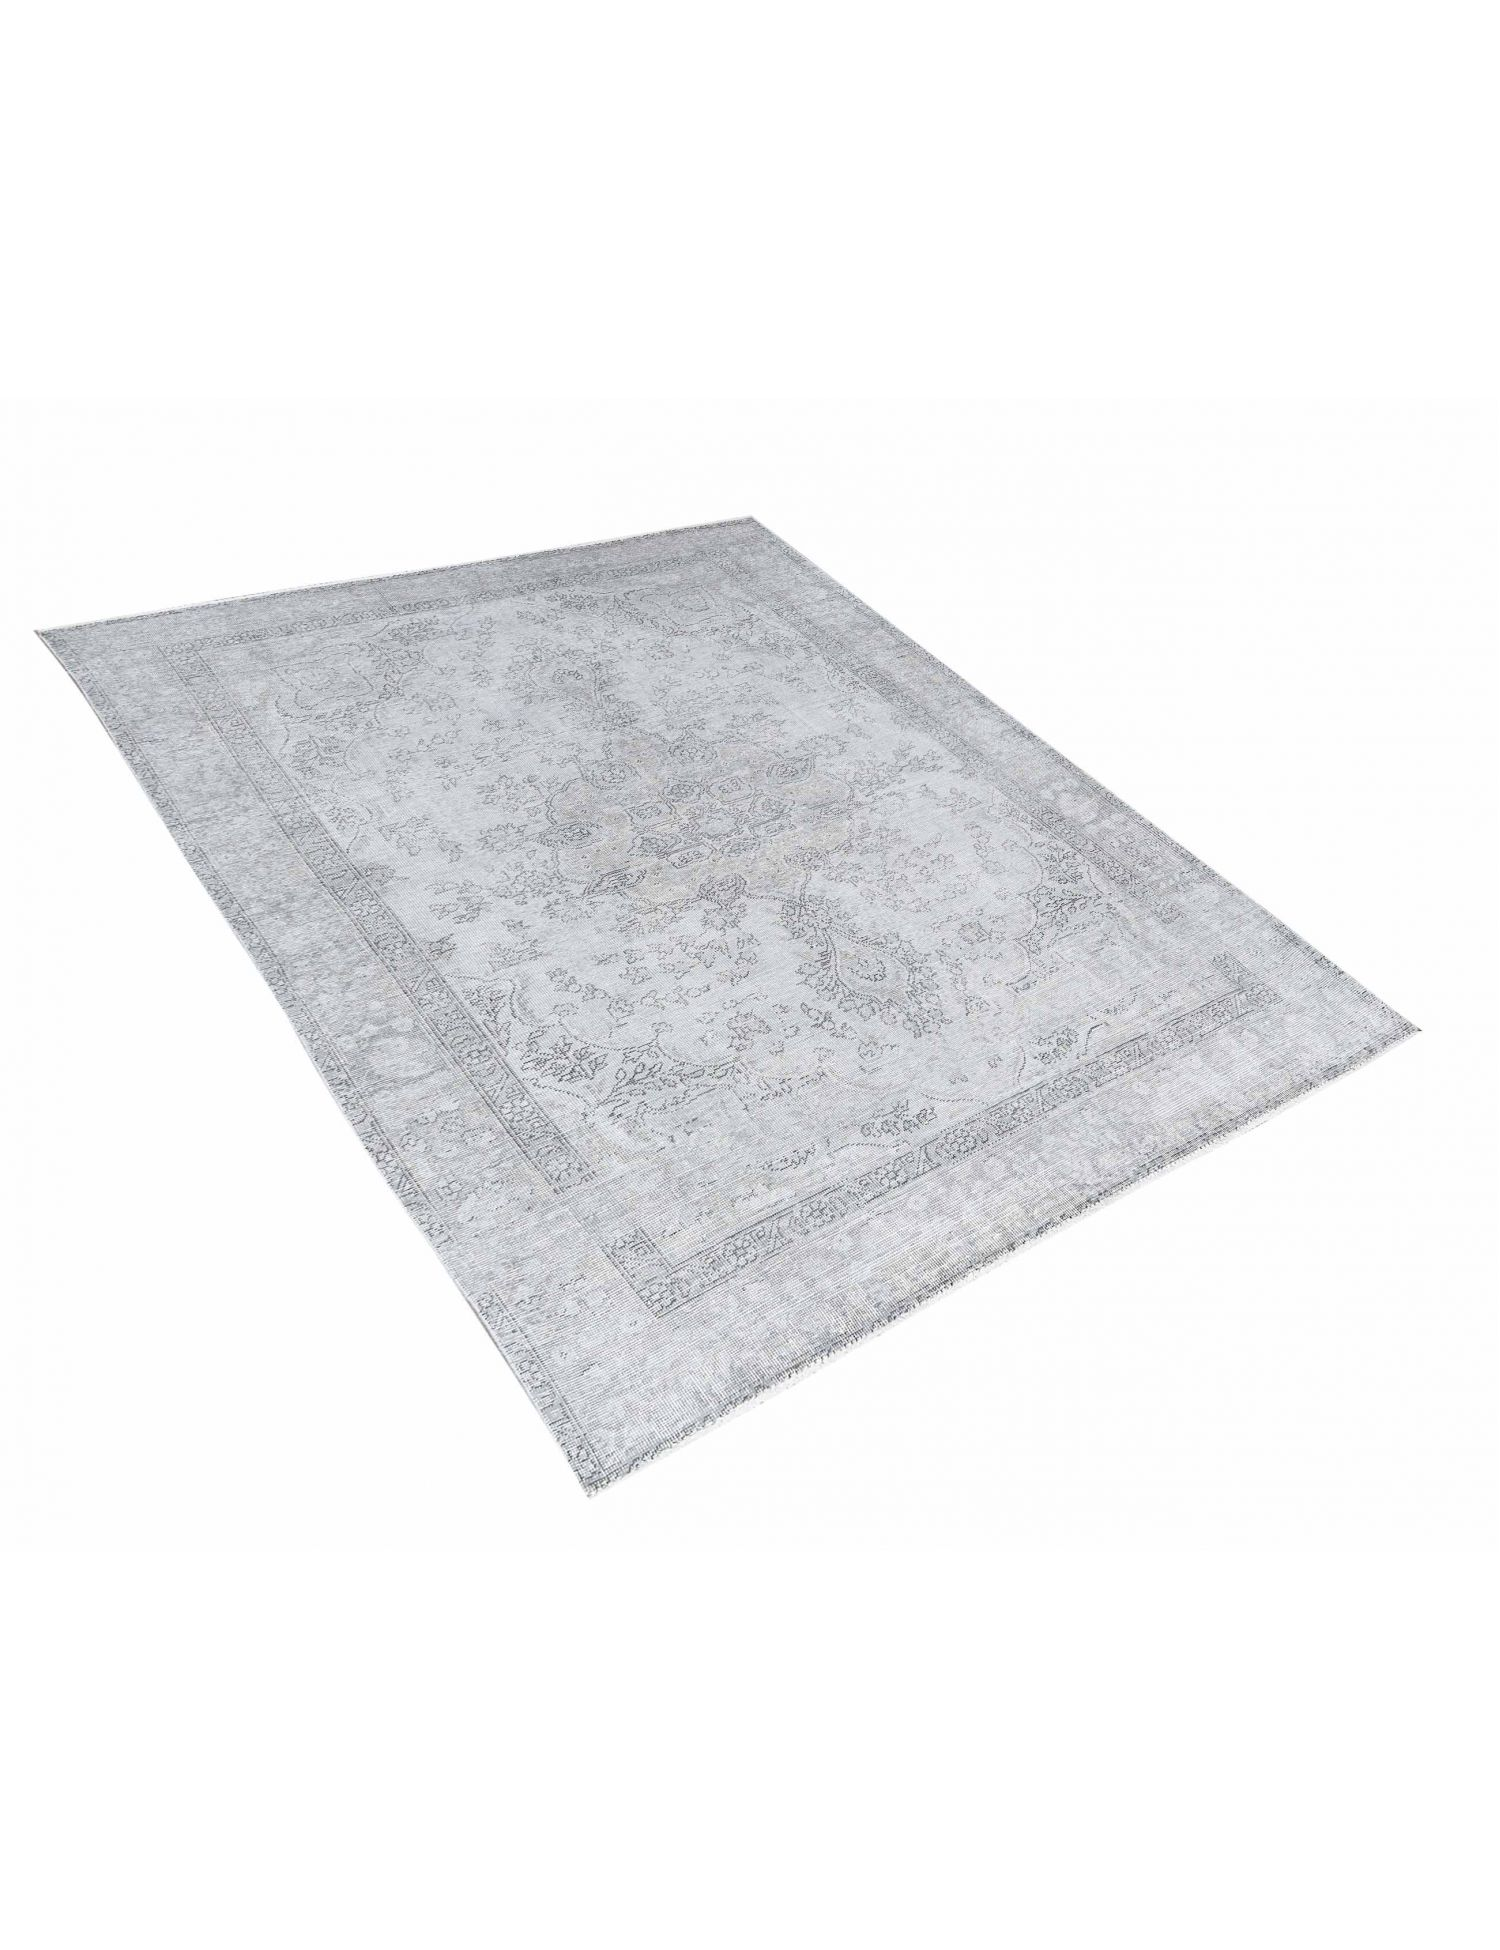 Persian Vintage Carpet  grey <br/>268 x 196 cm